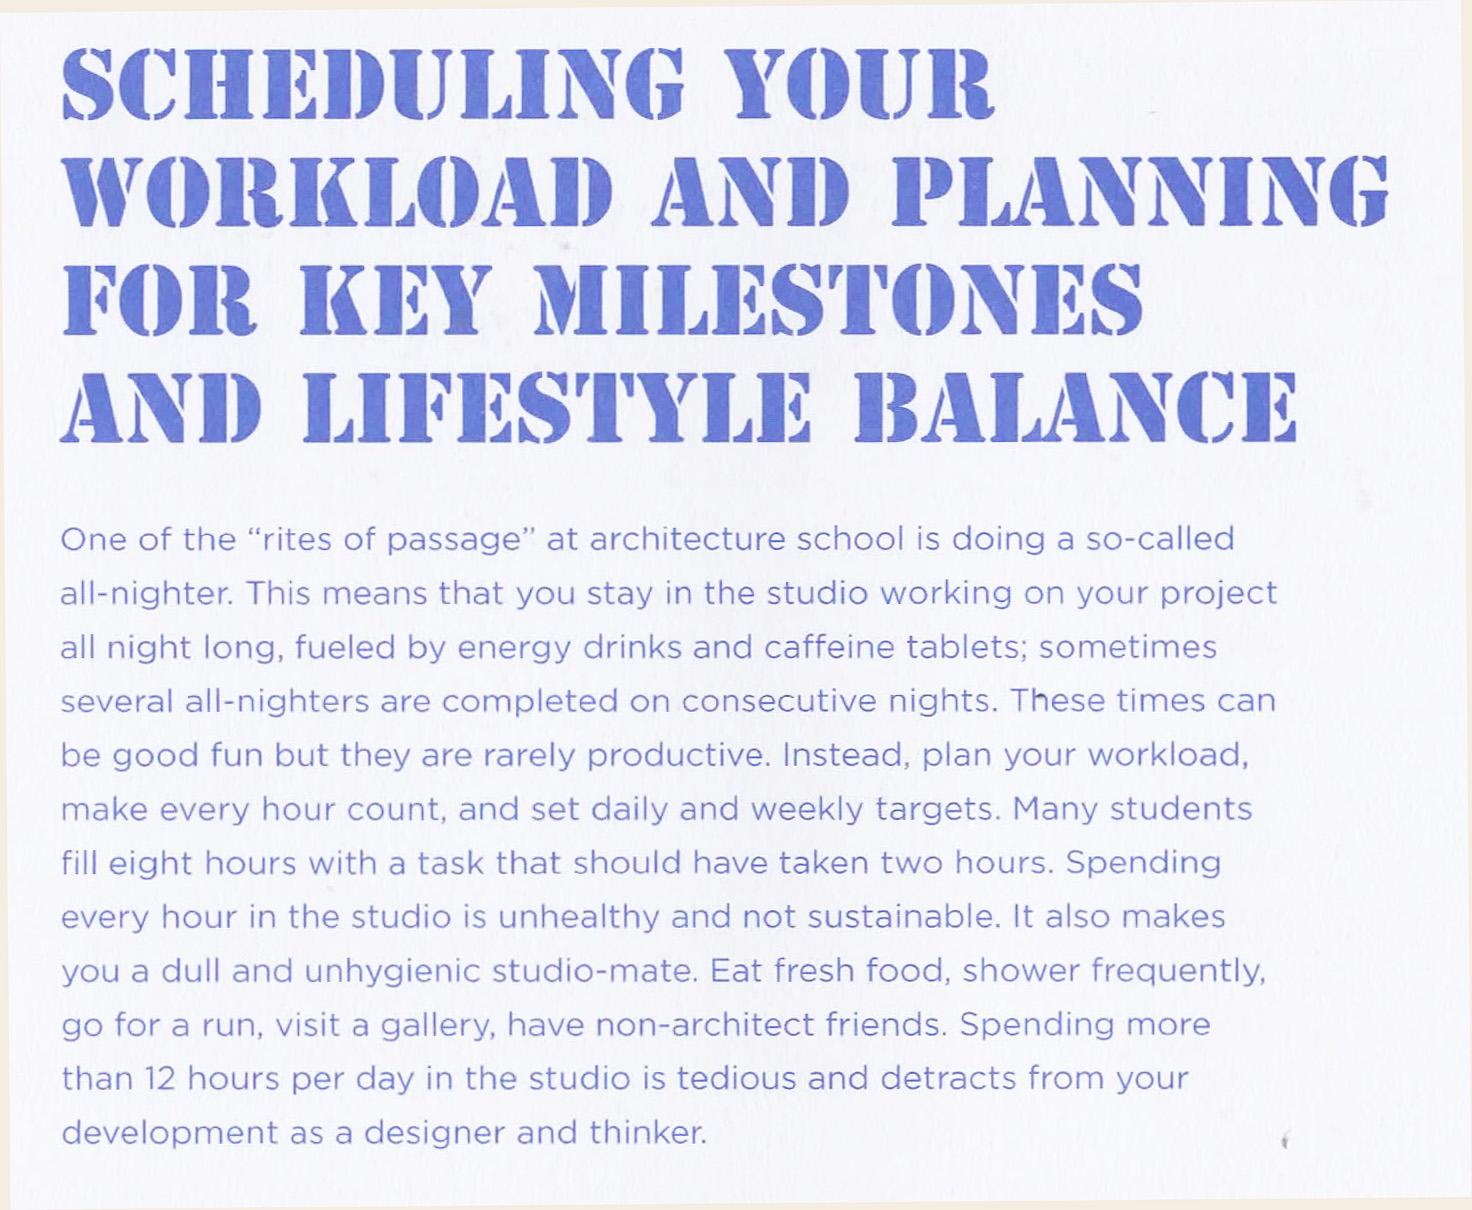 ArchitectureSchoolSurvivalGuide-SchedulingWorkload-p150.jpeg